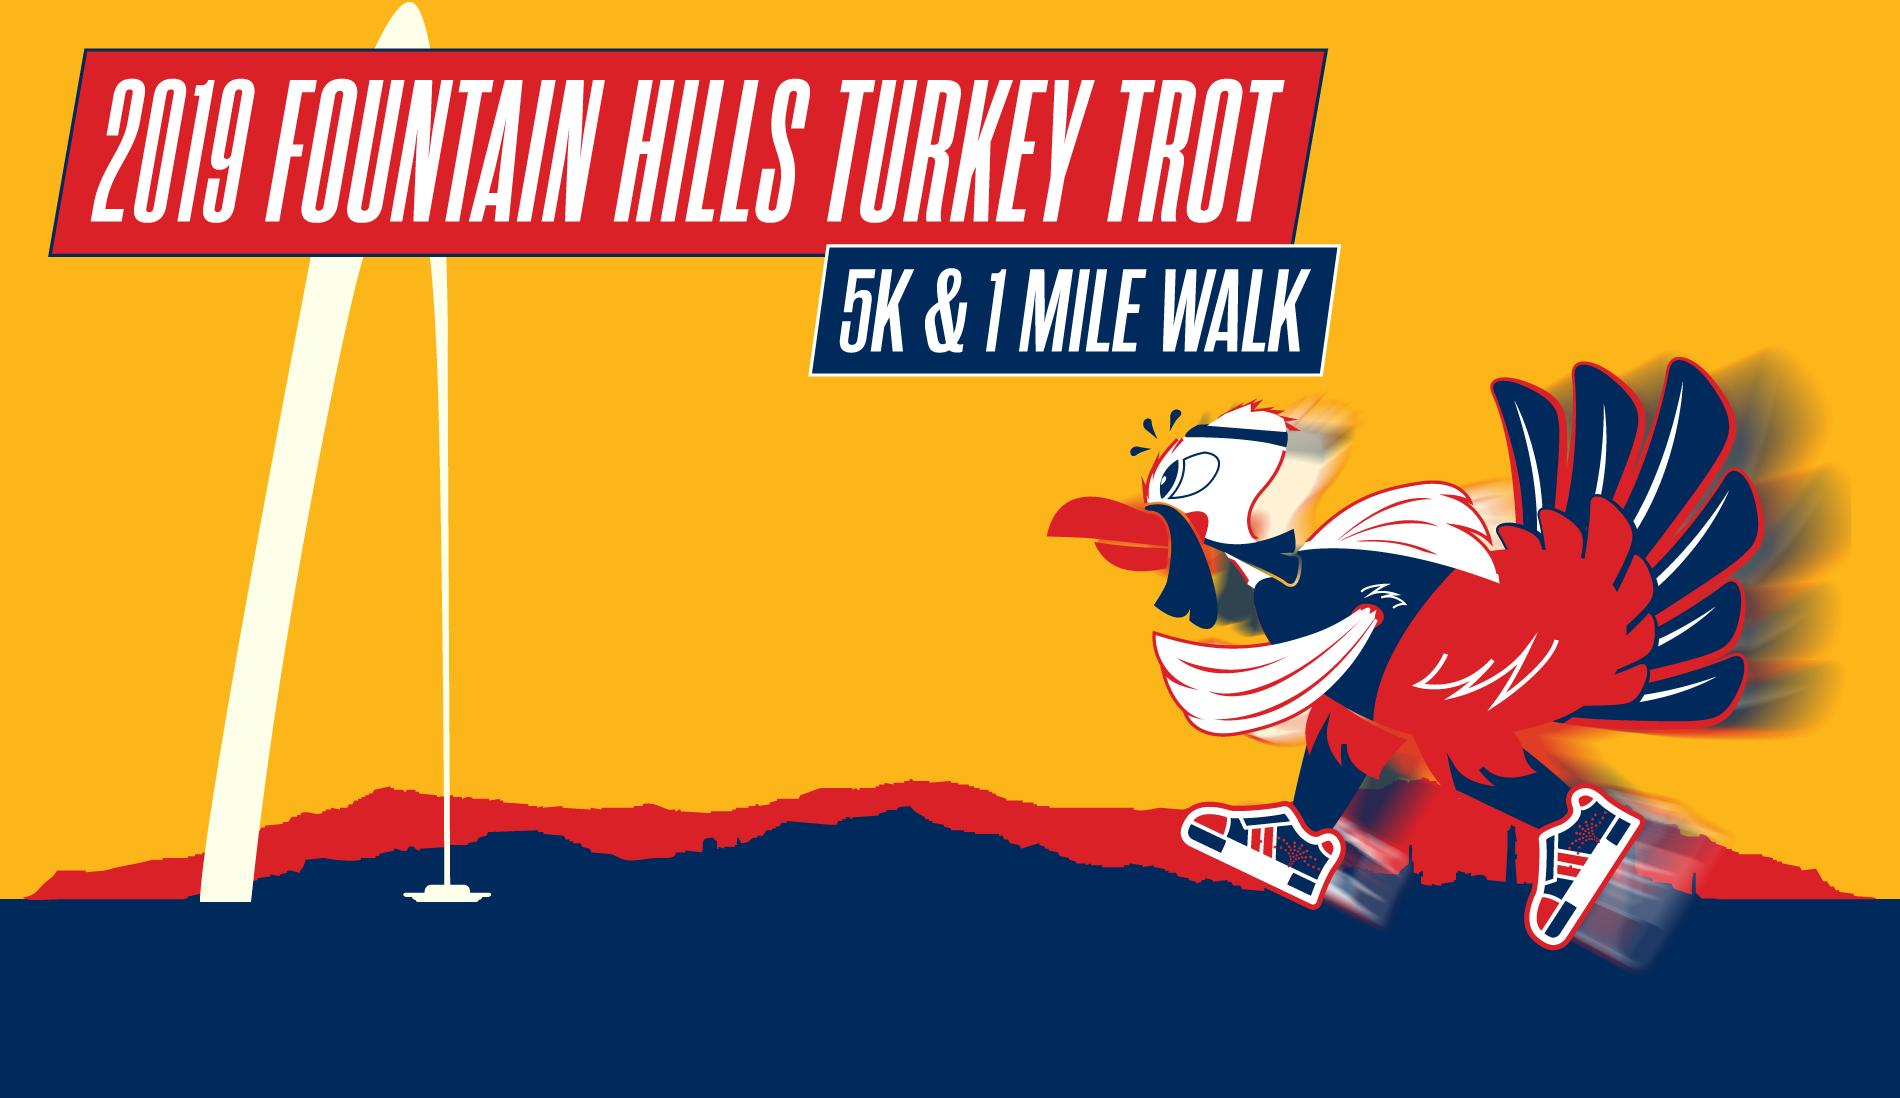 Fountain Hills Turkey Trot